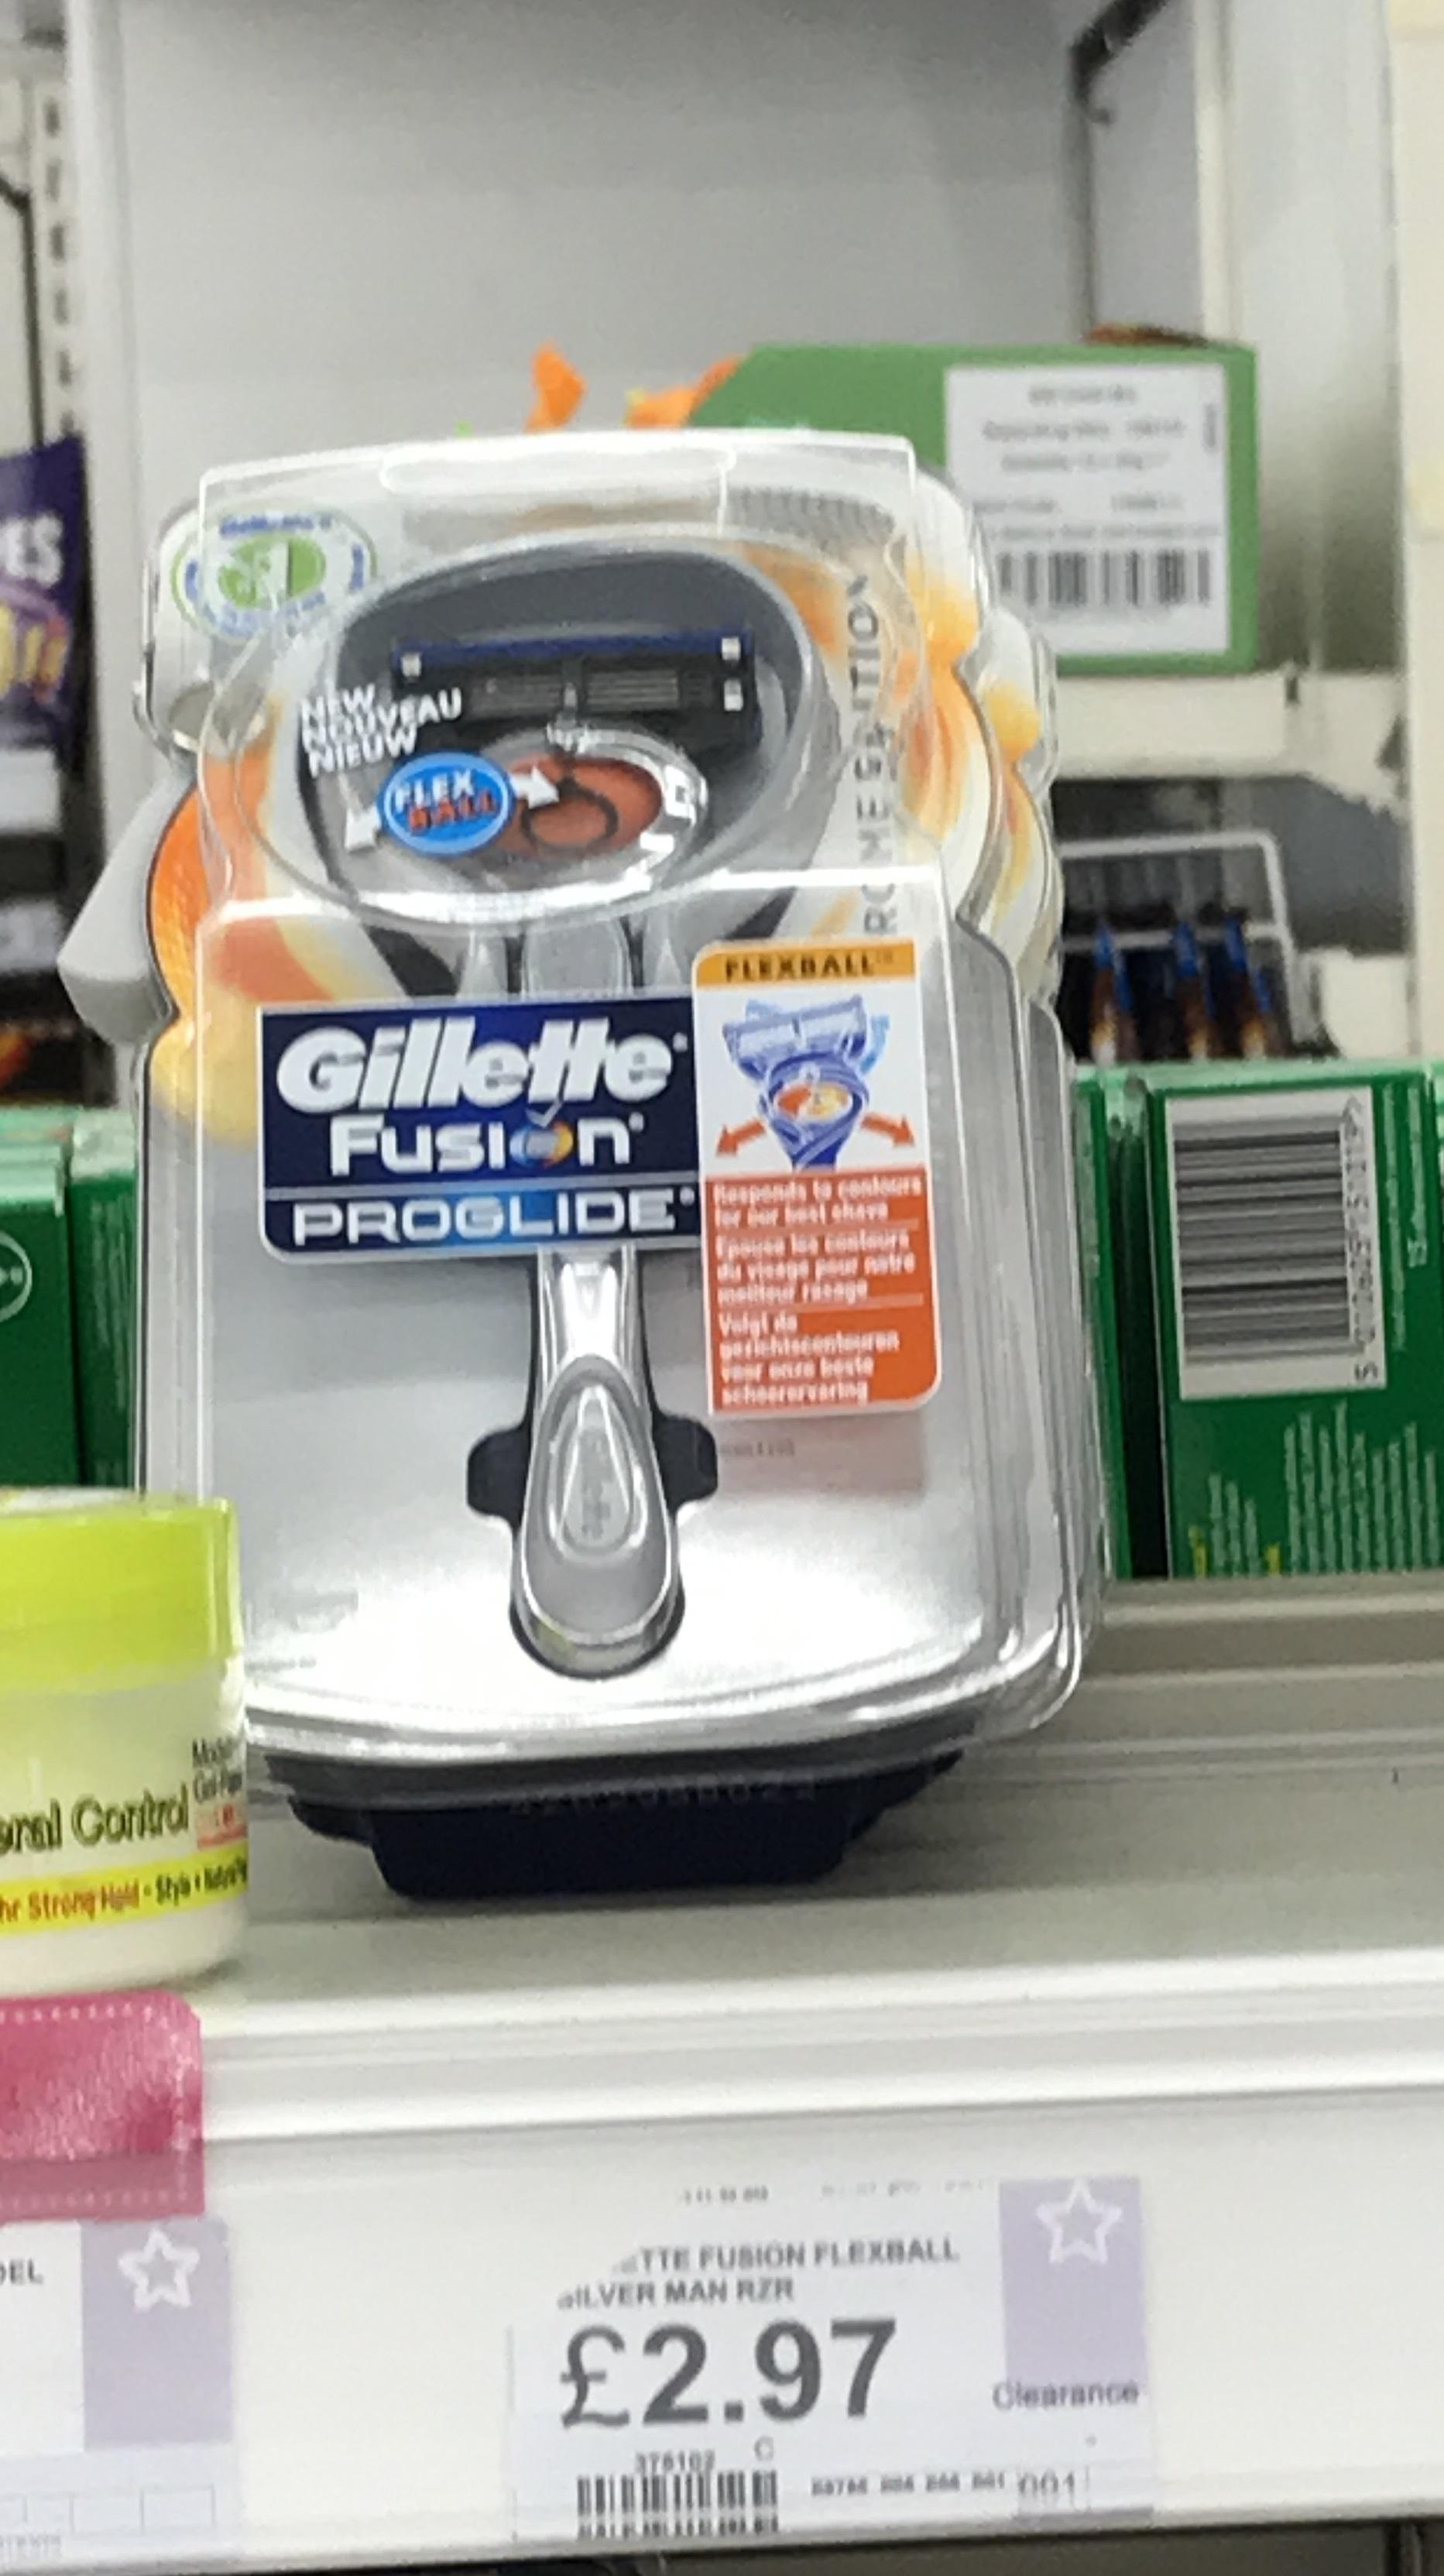 Gillette Fusion Proglide flexball in Superdrug only £2.97